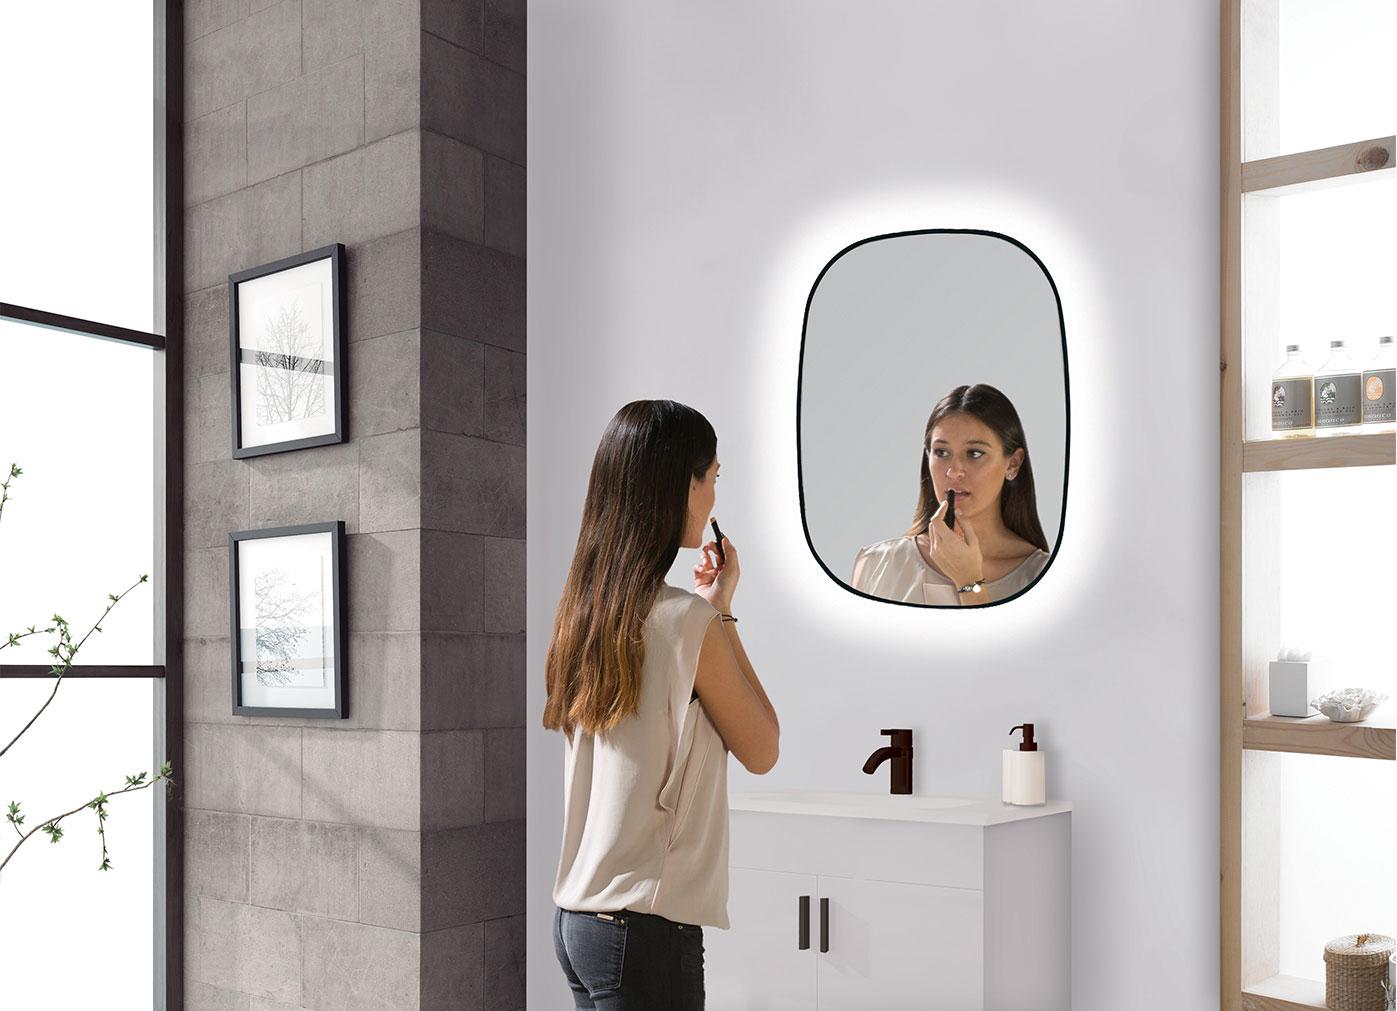 led-zrkadlo-sand-60x70cm-LNR3475-dizajnova-1